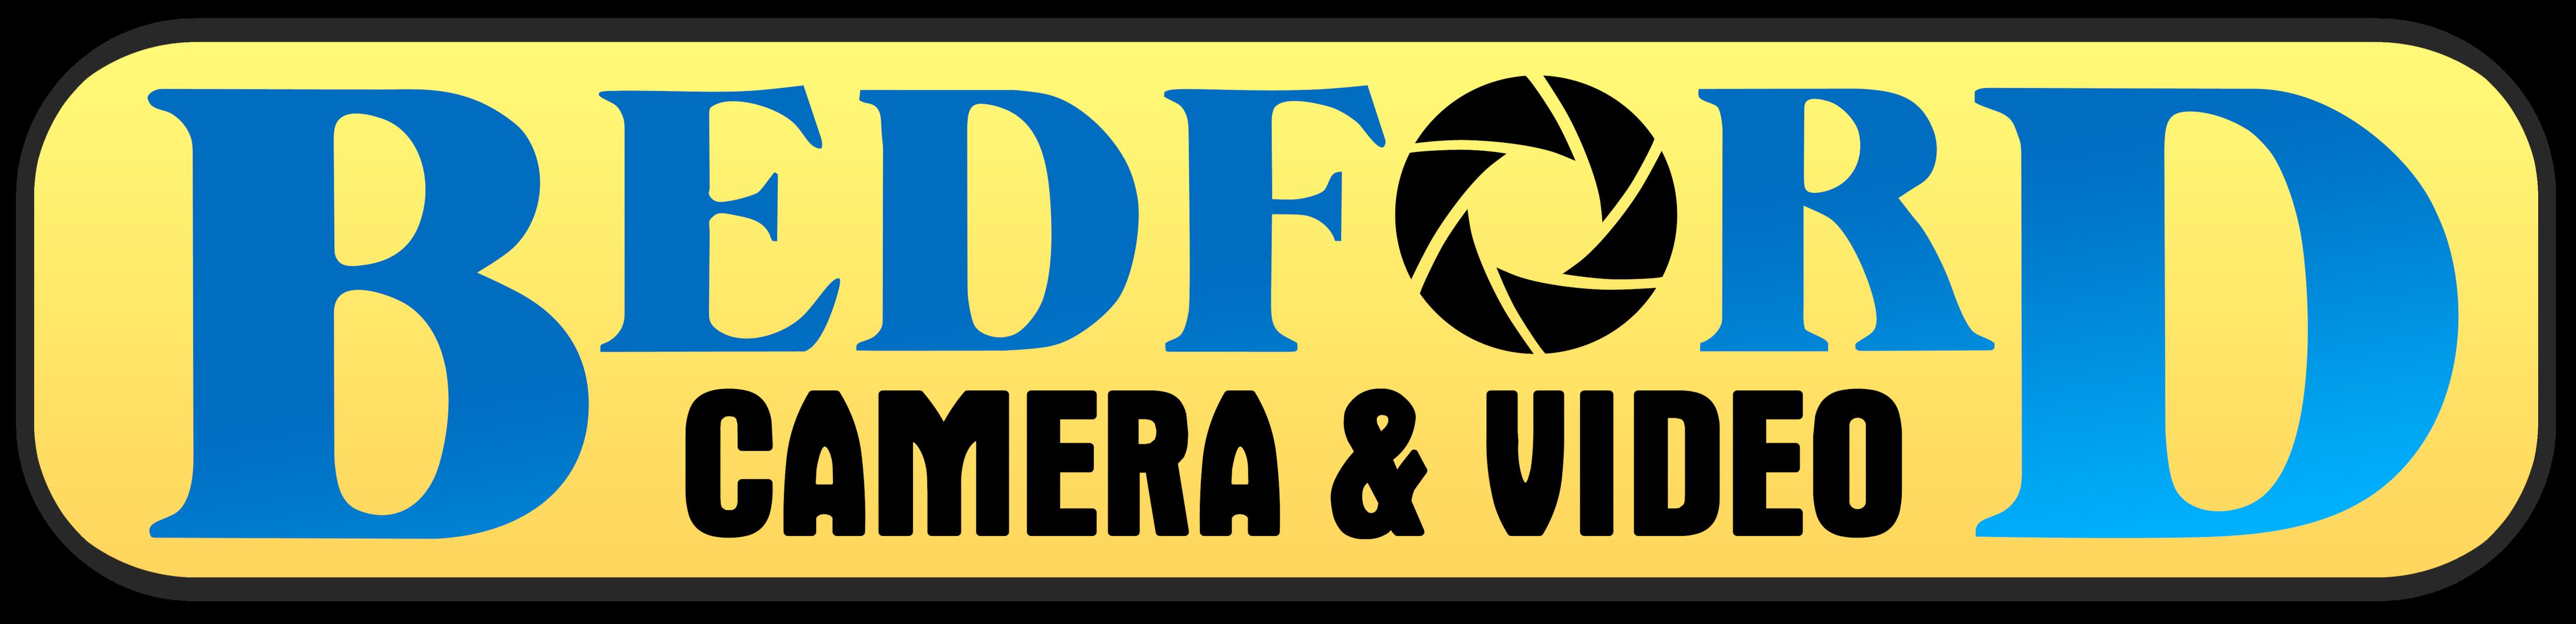 bedford-logo-large-6x24.png